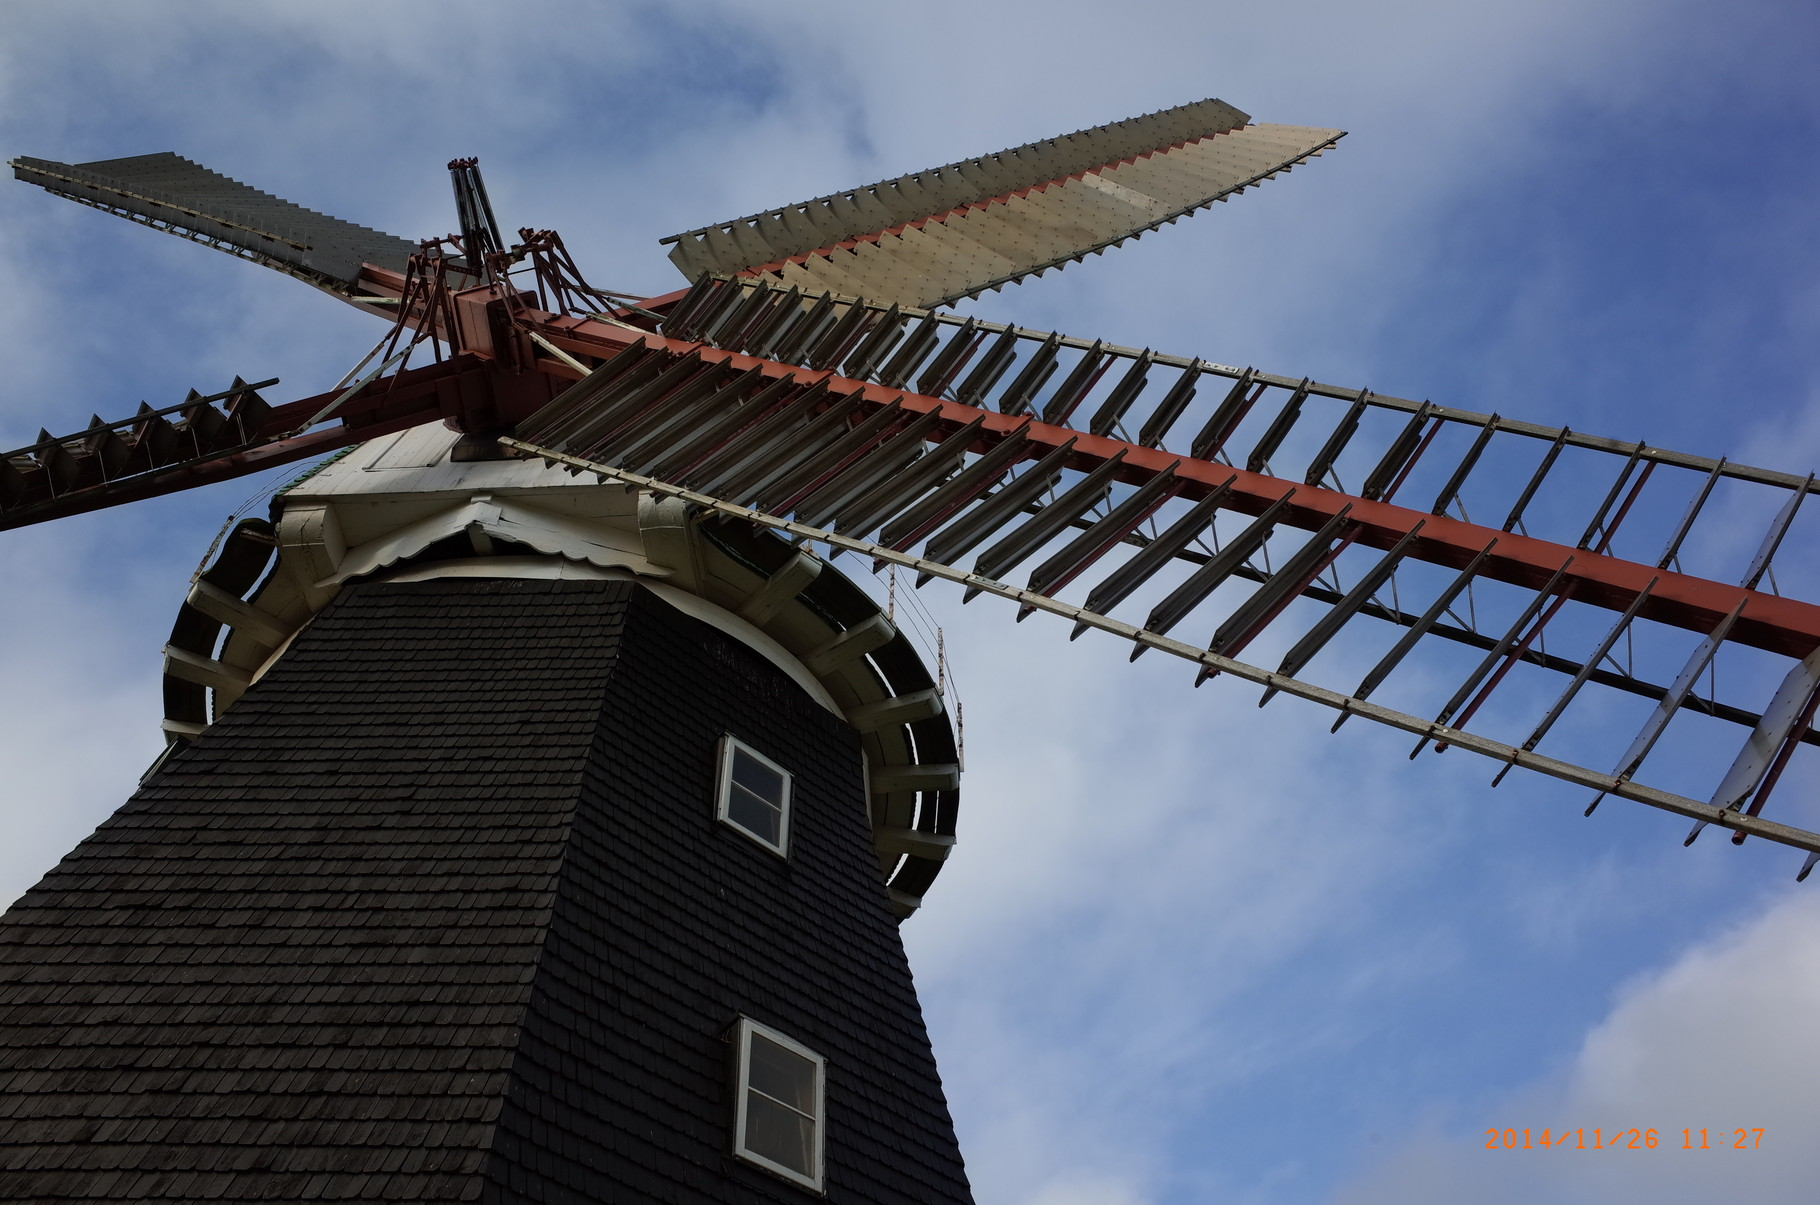 Holländerwindmühle Stove am 26.11.2014